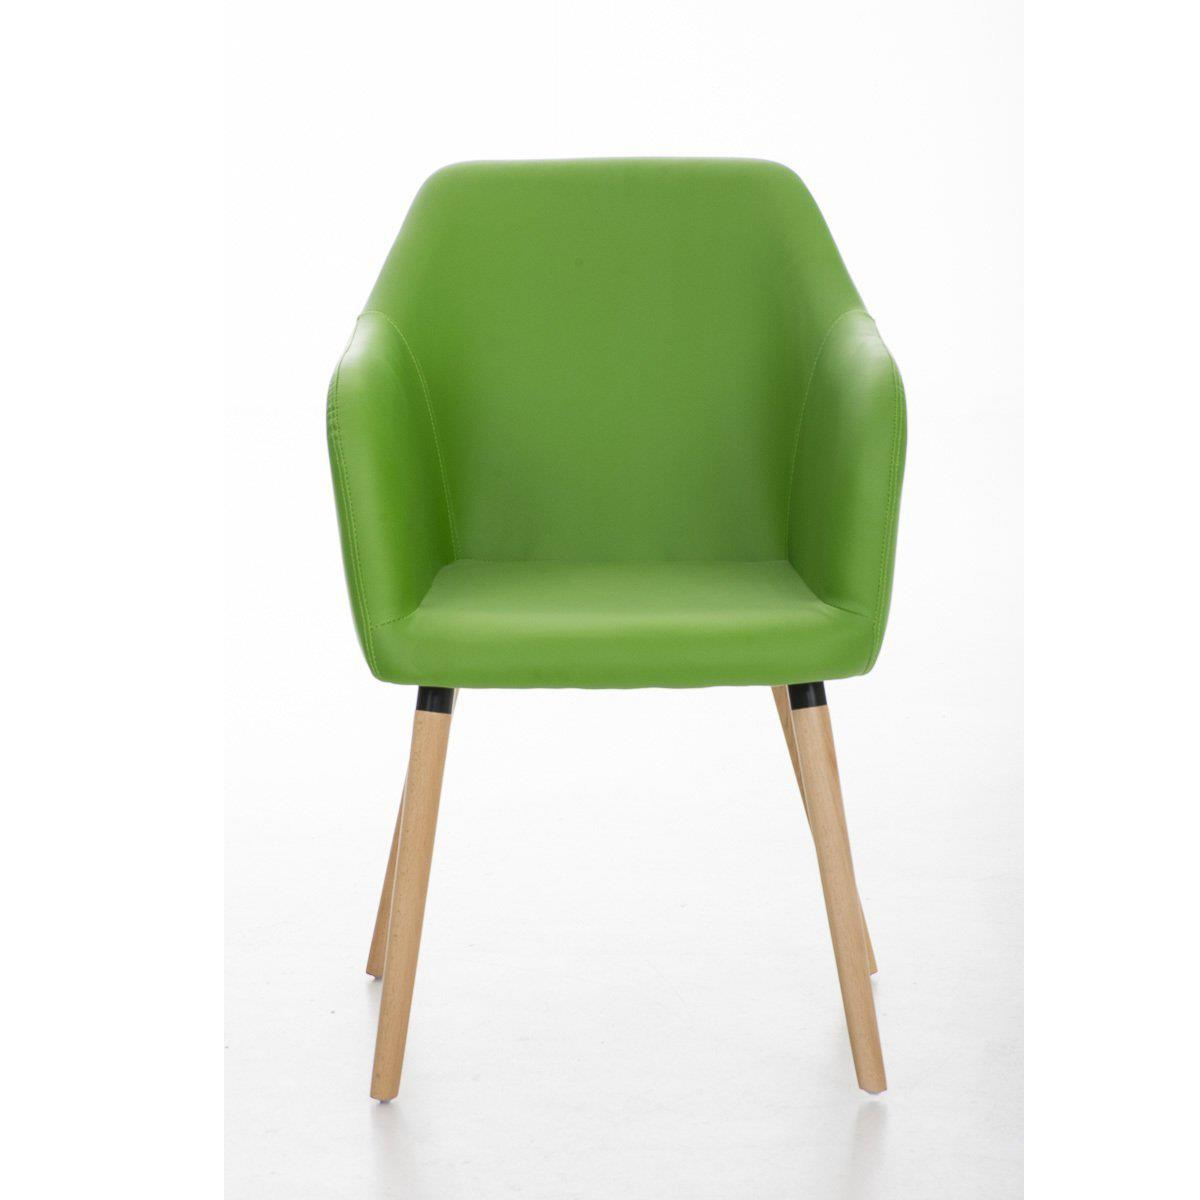 Sedia per Sala d'Attesa NIEBLA PELLE, Comoda imbottitura, Struttura e gambe in Legno, Seduta in Pelle, Verde